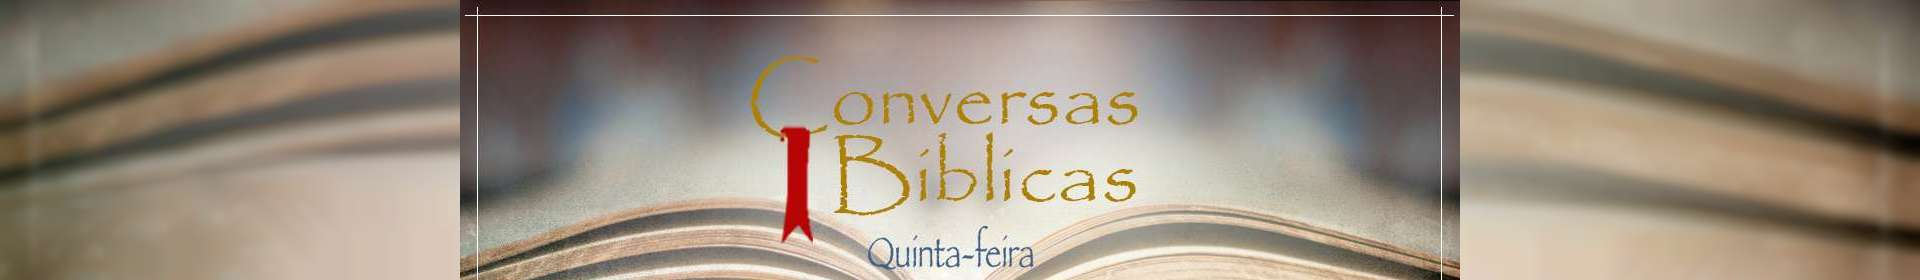 Conversas Bíblicas: Jerusalém - Parte 2